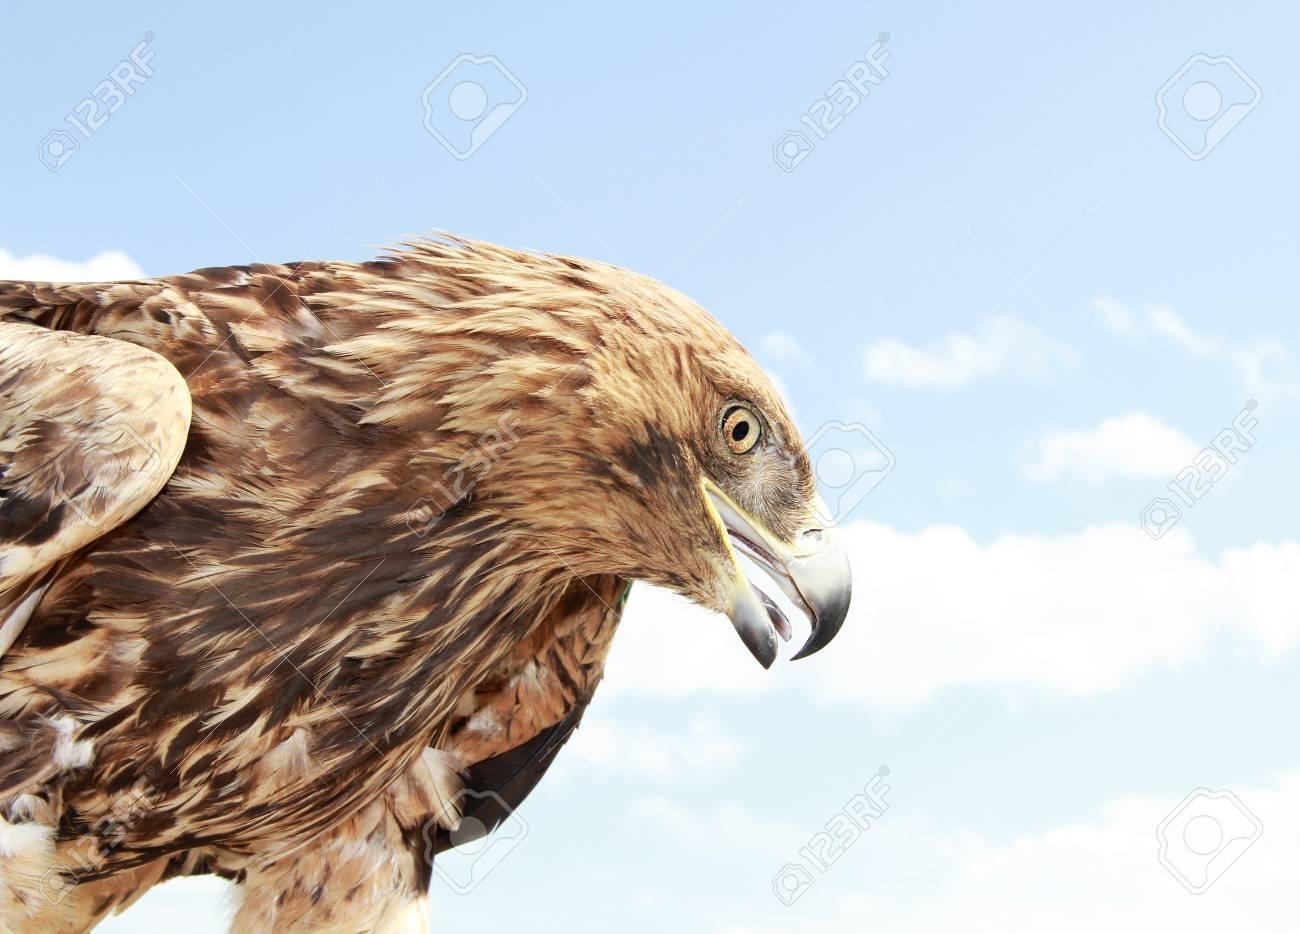 Eagle head on blue sky background  Close up Stock Photo - 14205158